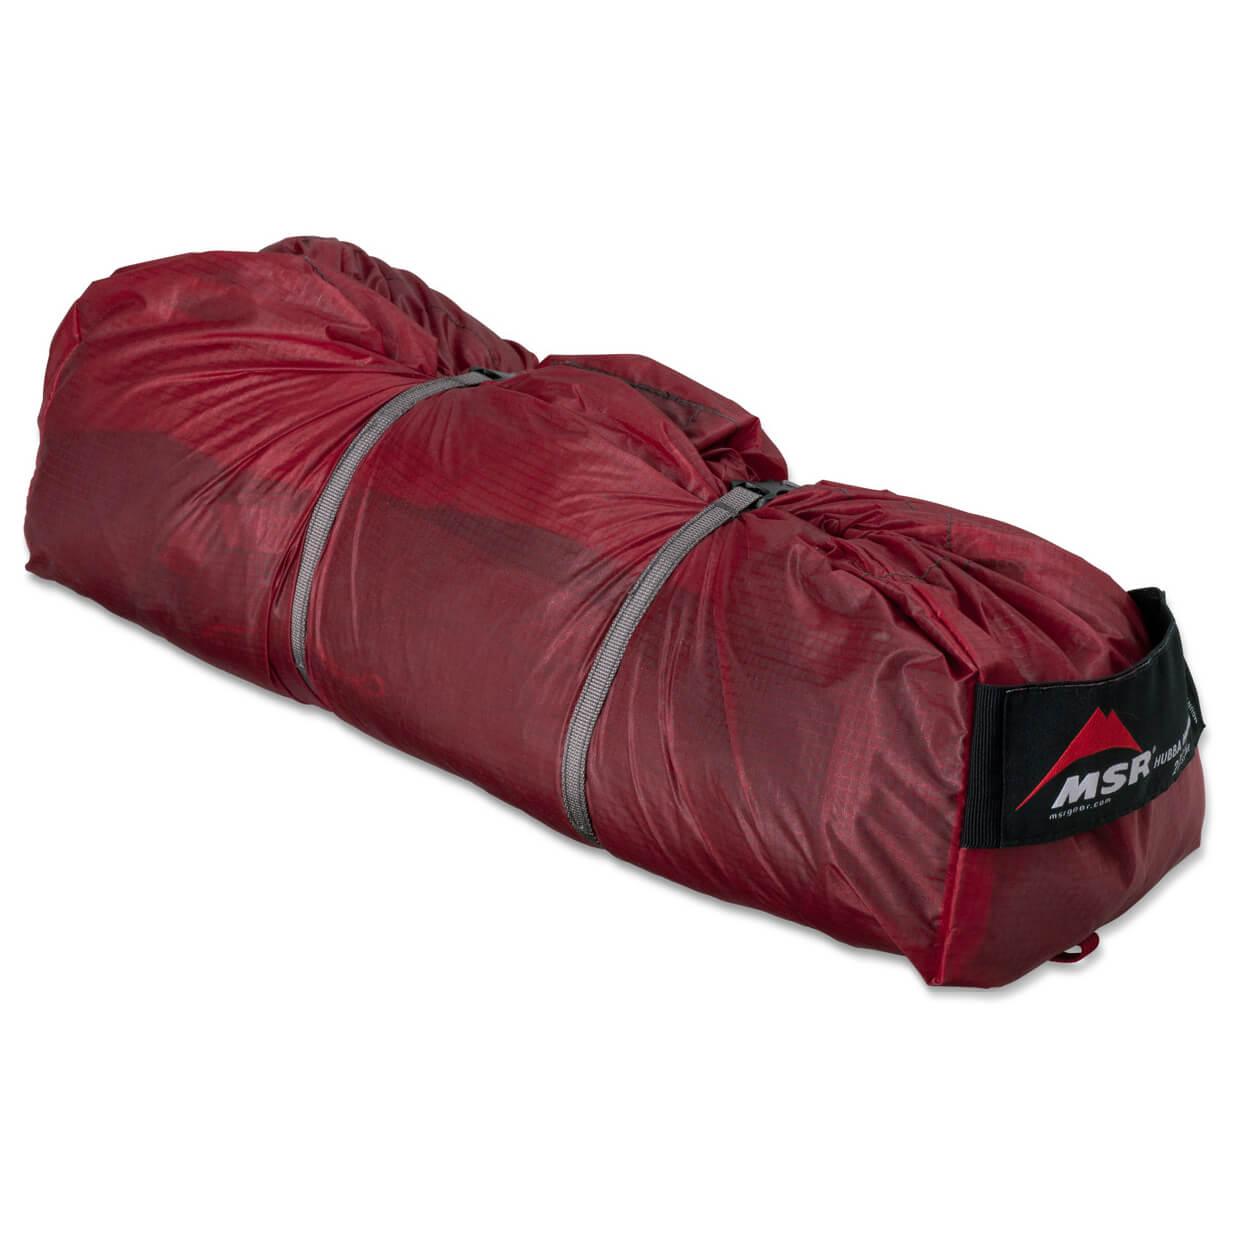 ... MSR - Hubba Hubba NX - 2-person tent ... fe85f3a00